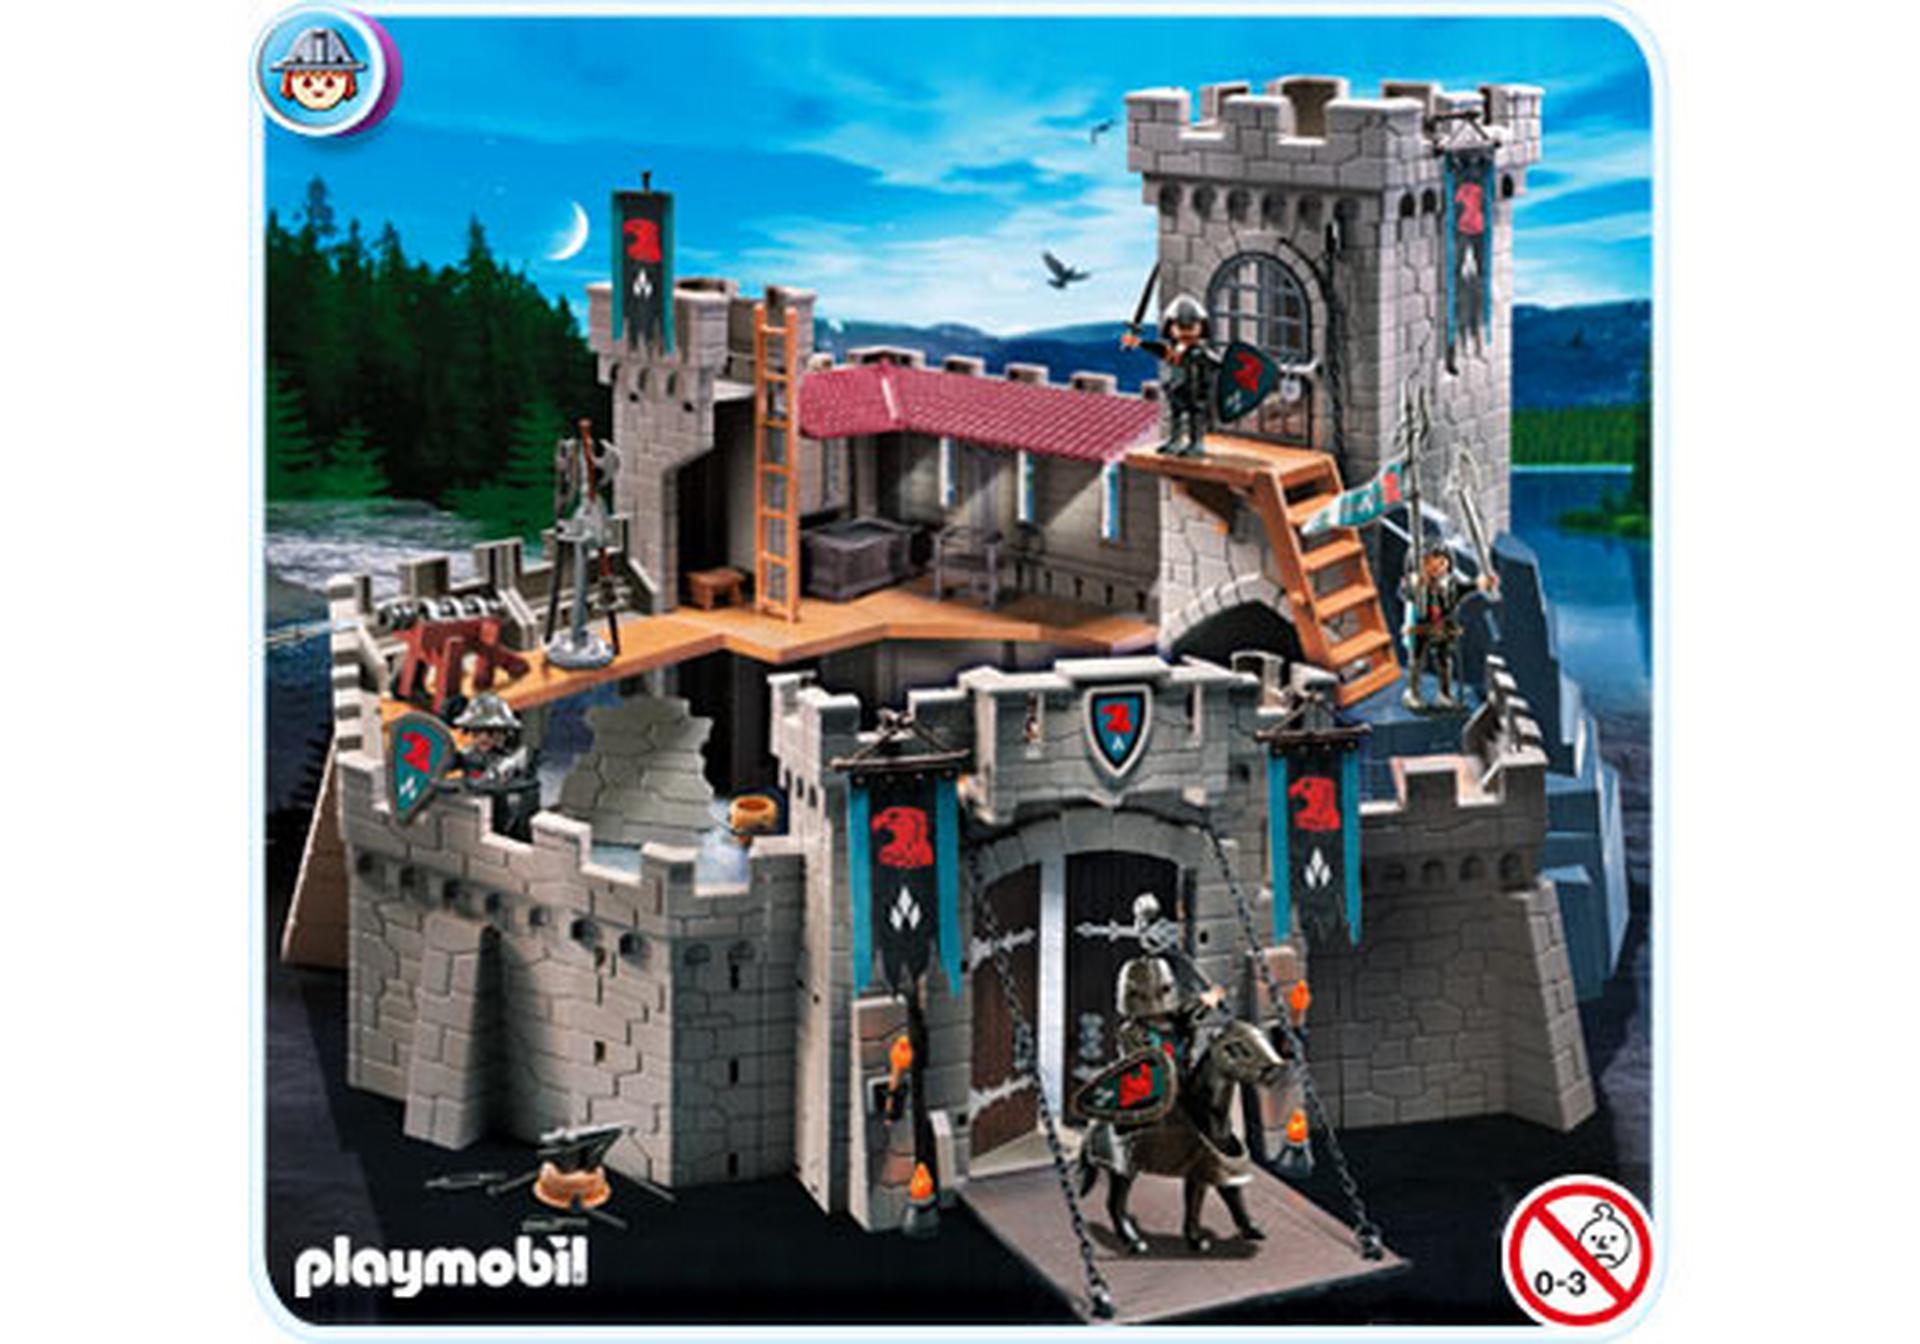 Raubritterburg 4866 a playmobil deutschland - Chateau chevalier playmobil ...